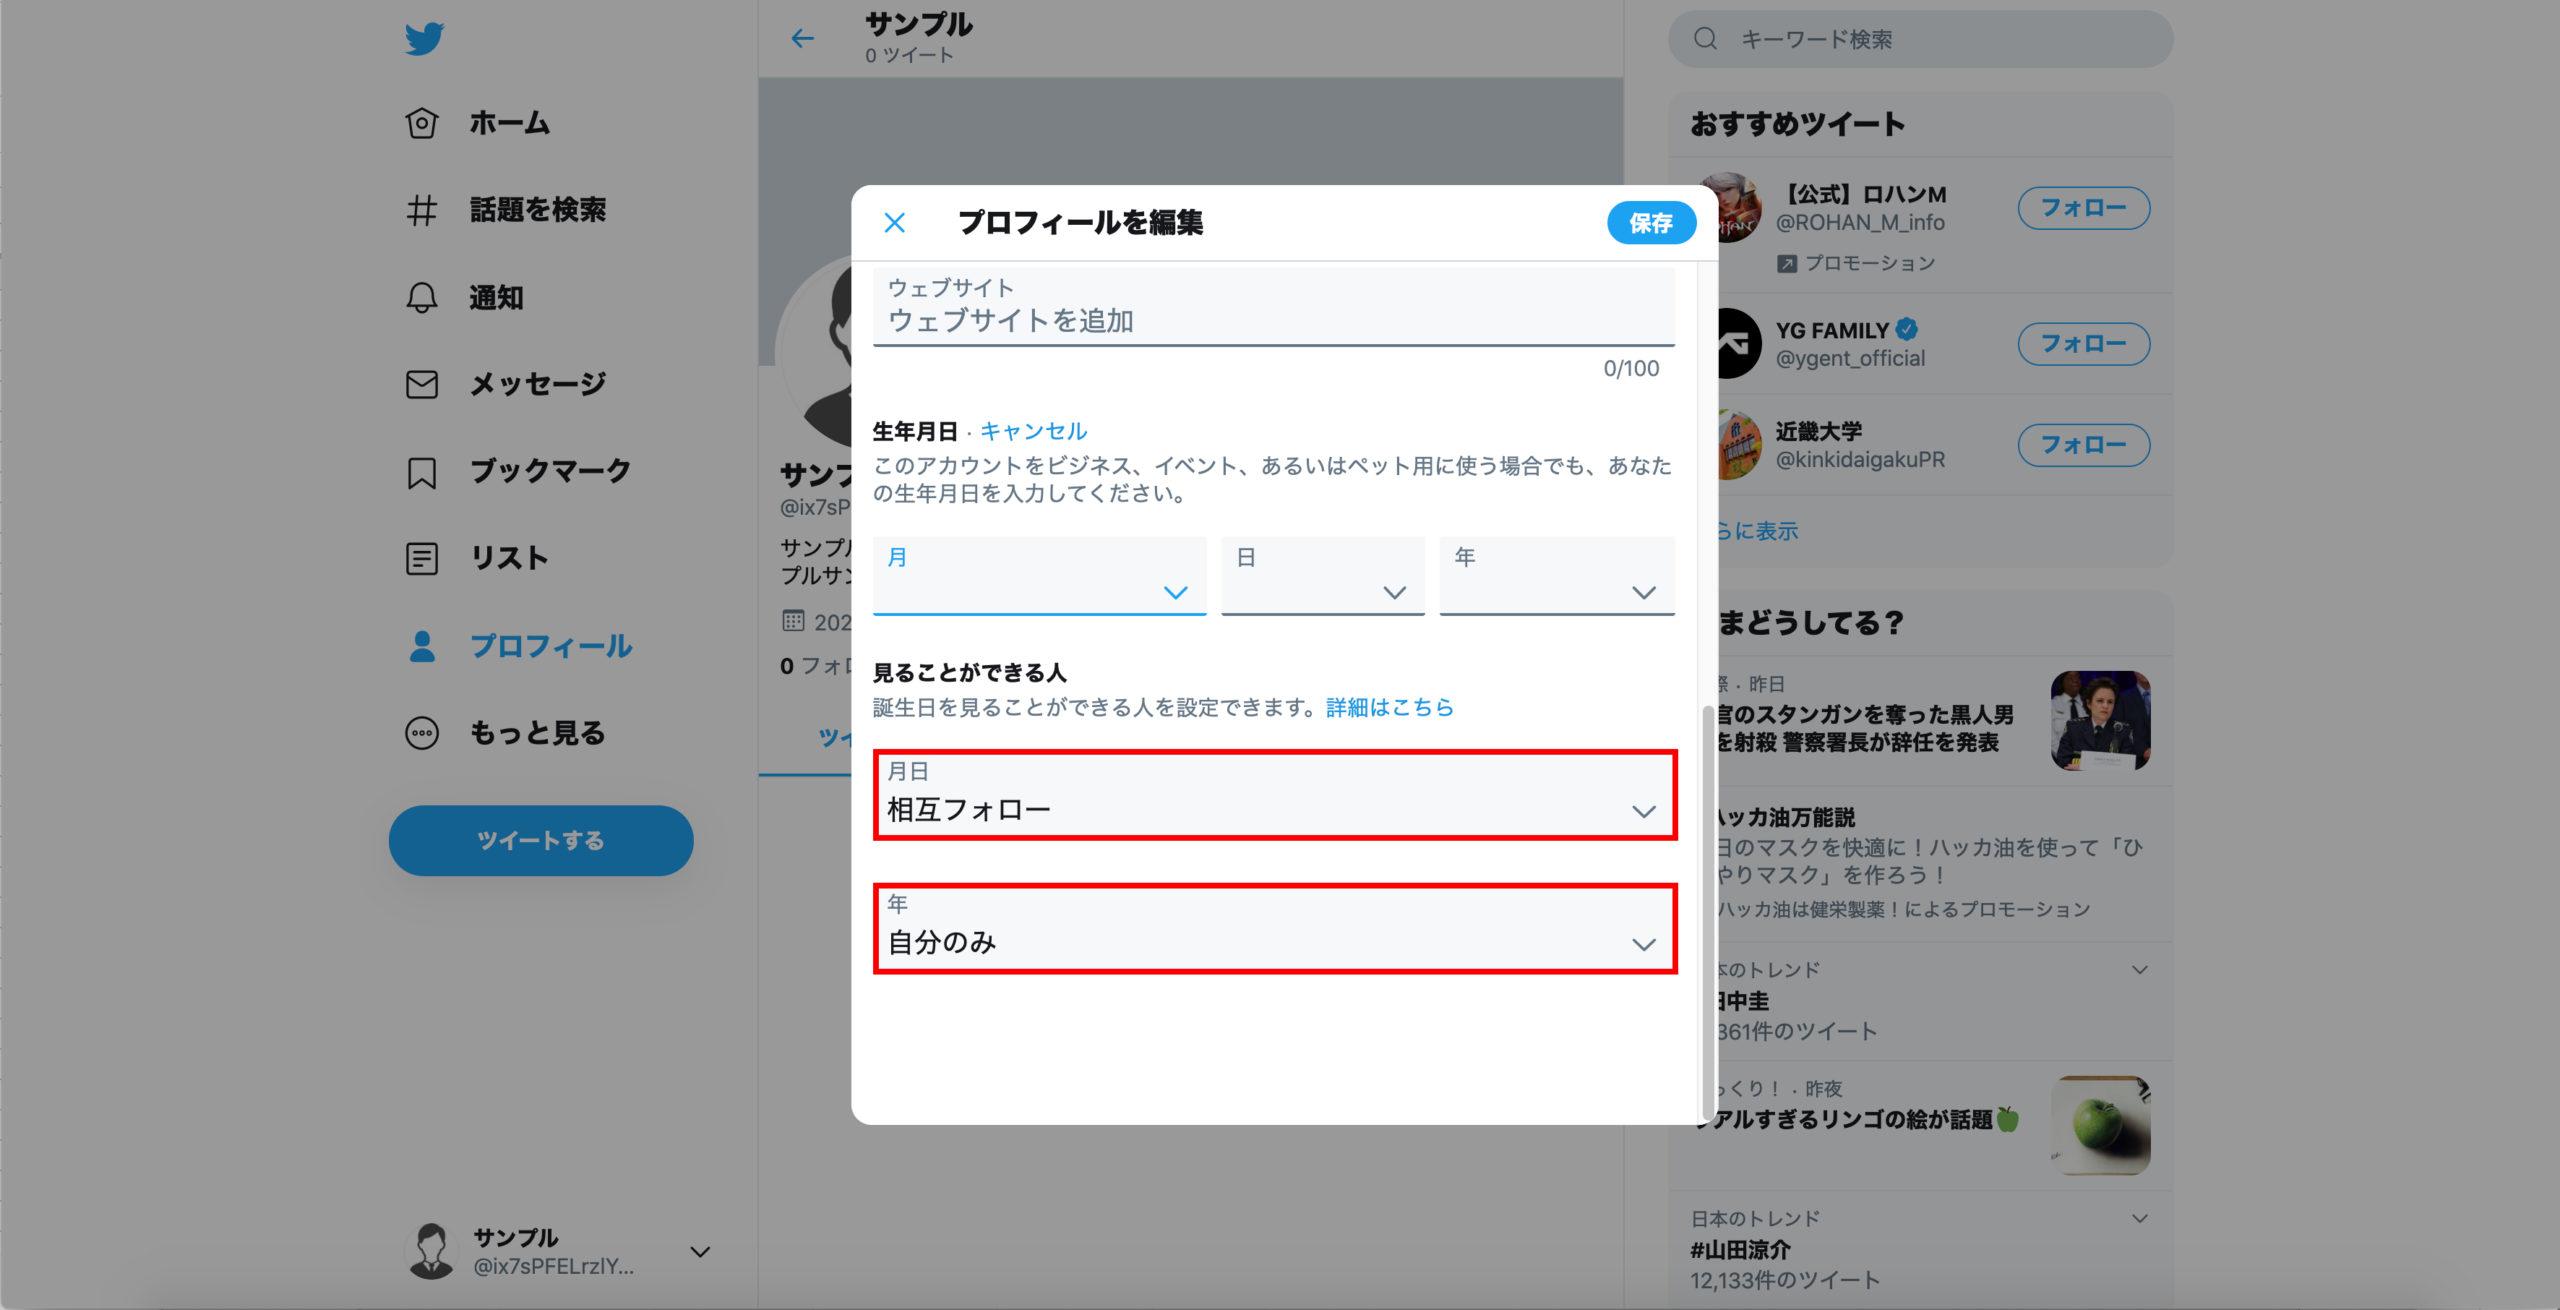 Twitterの生年月日の公開範囲の設定